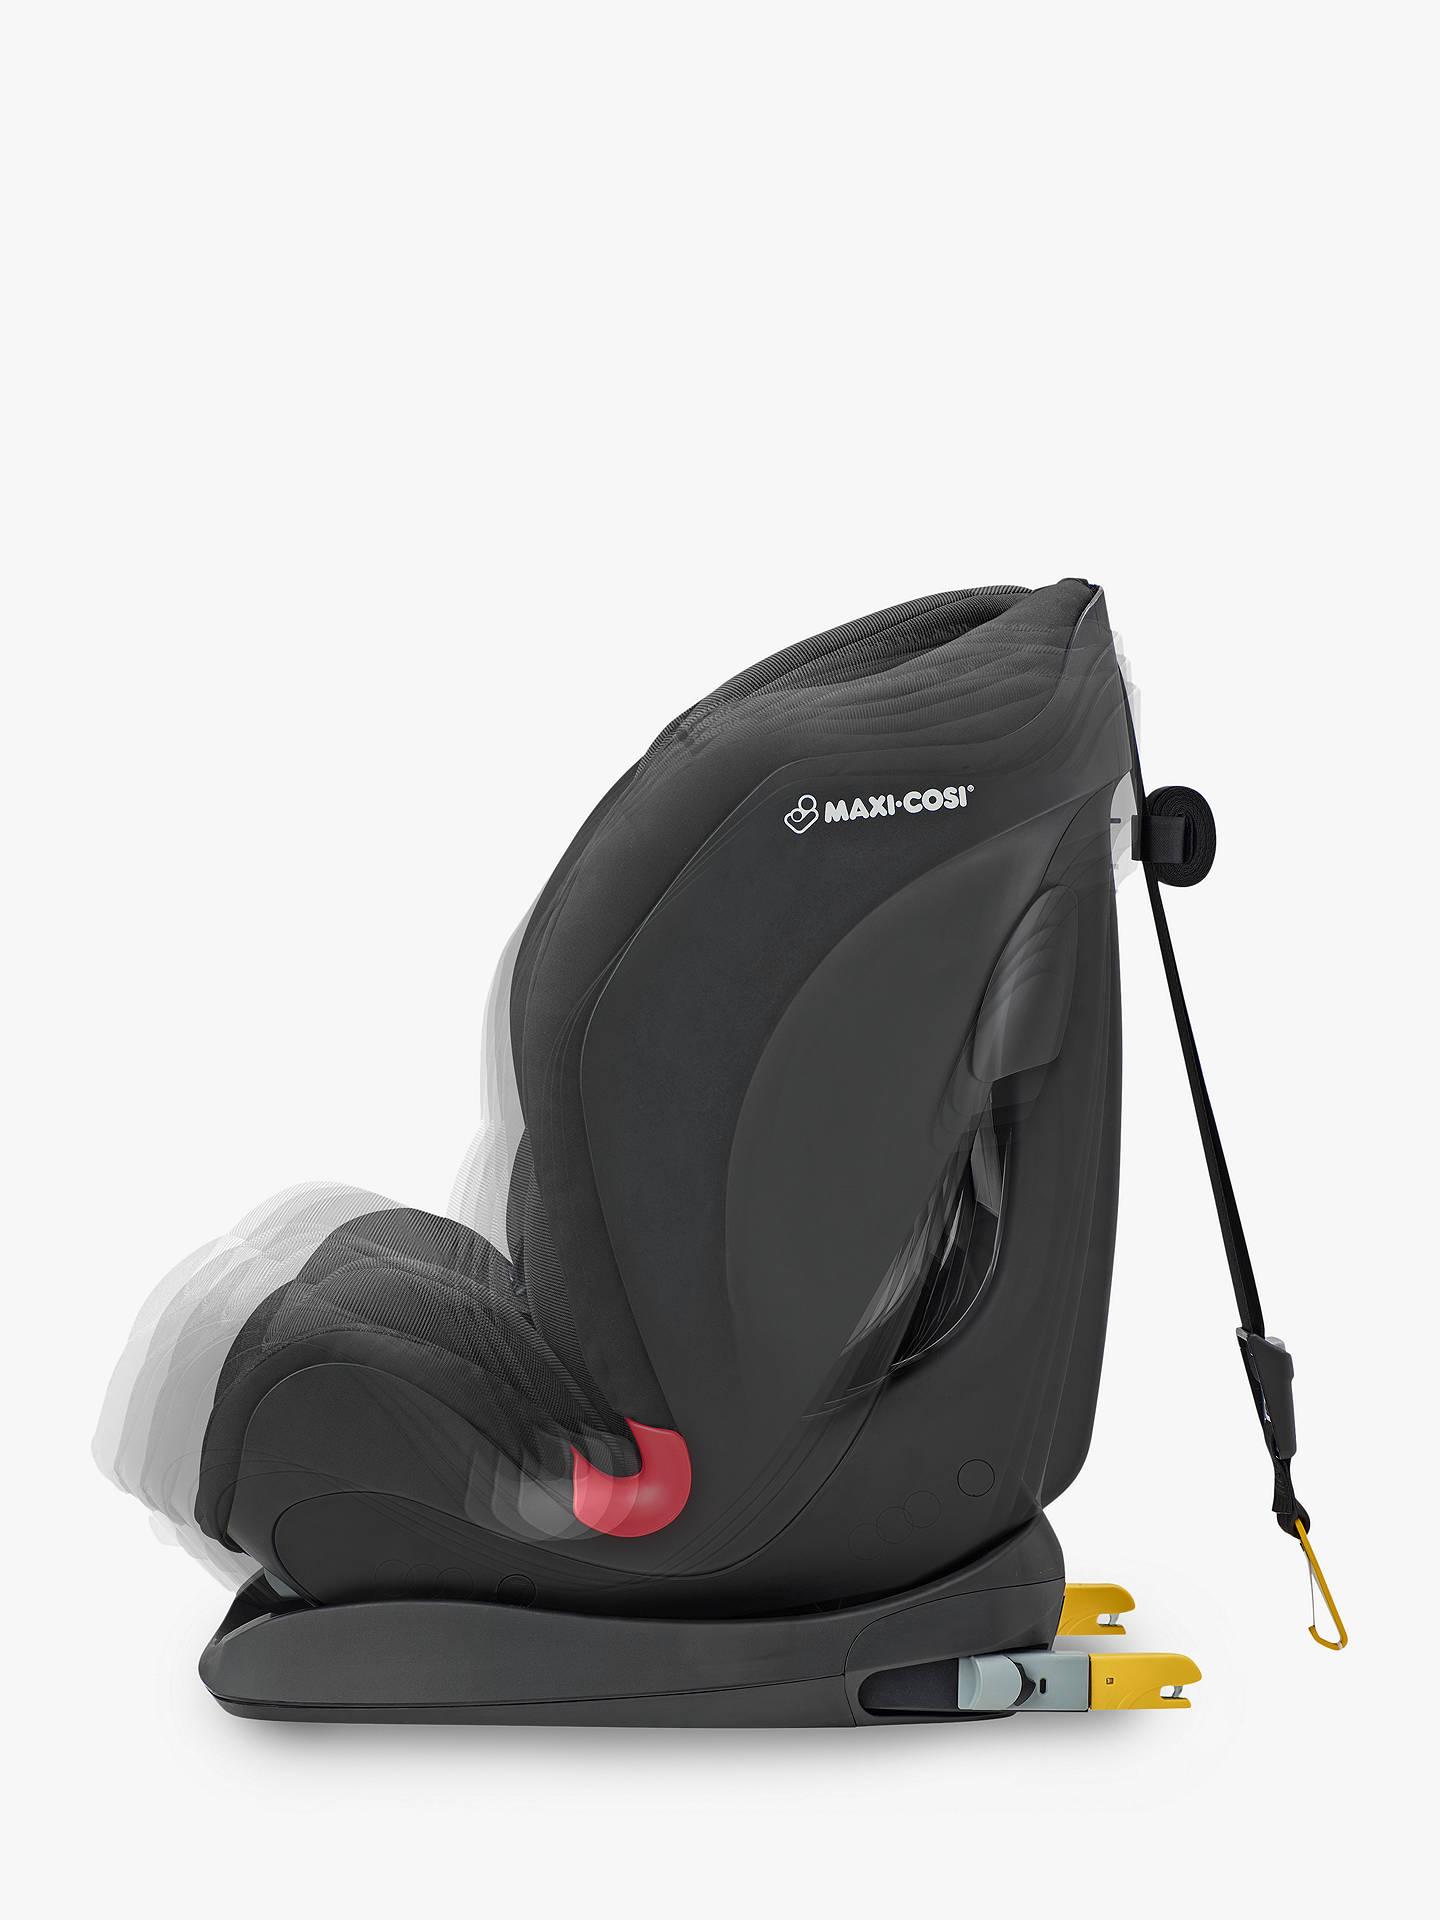 maxi cosi titan group 1 2 3 child car seat nomad black at john lewis partners. Black Bedroom Furniture Sets. Home Design Ideas